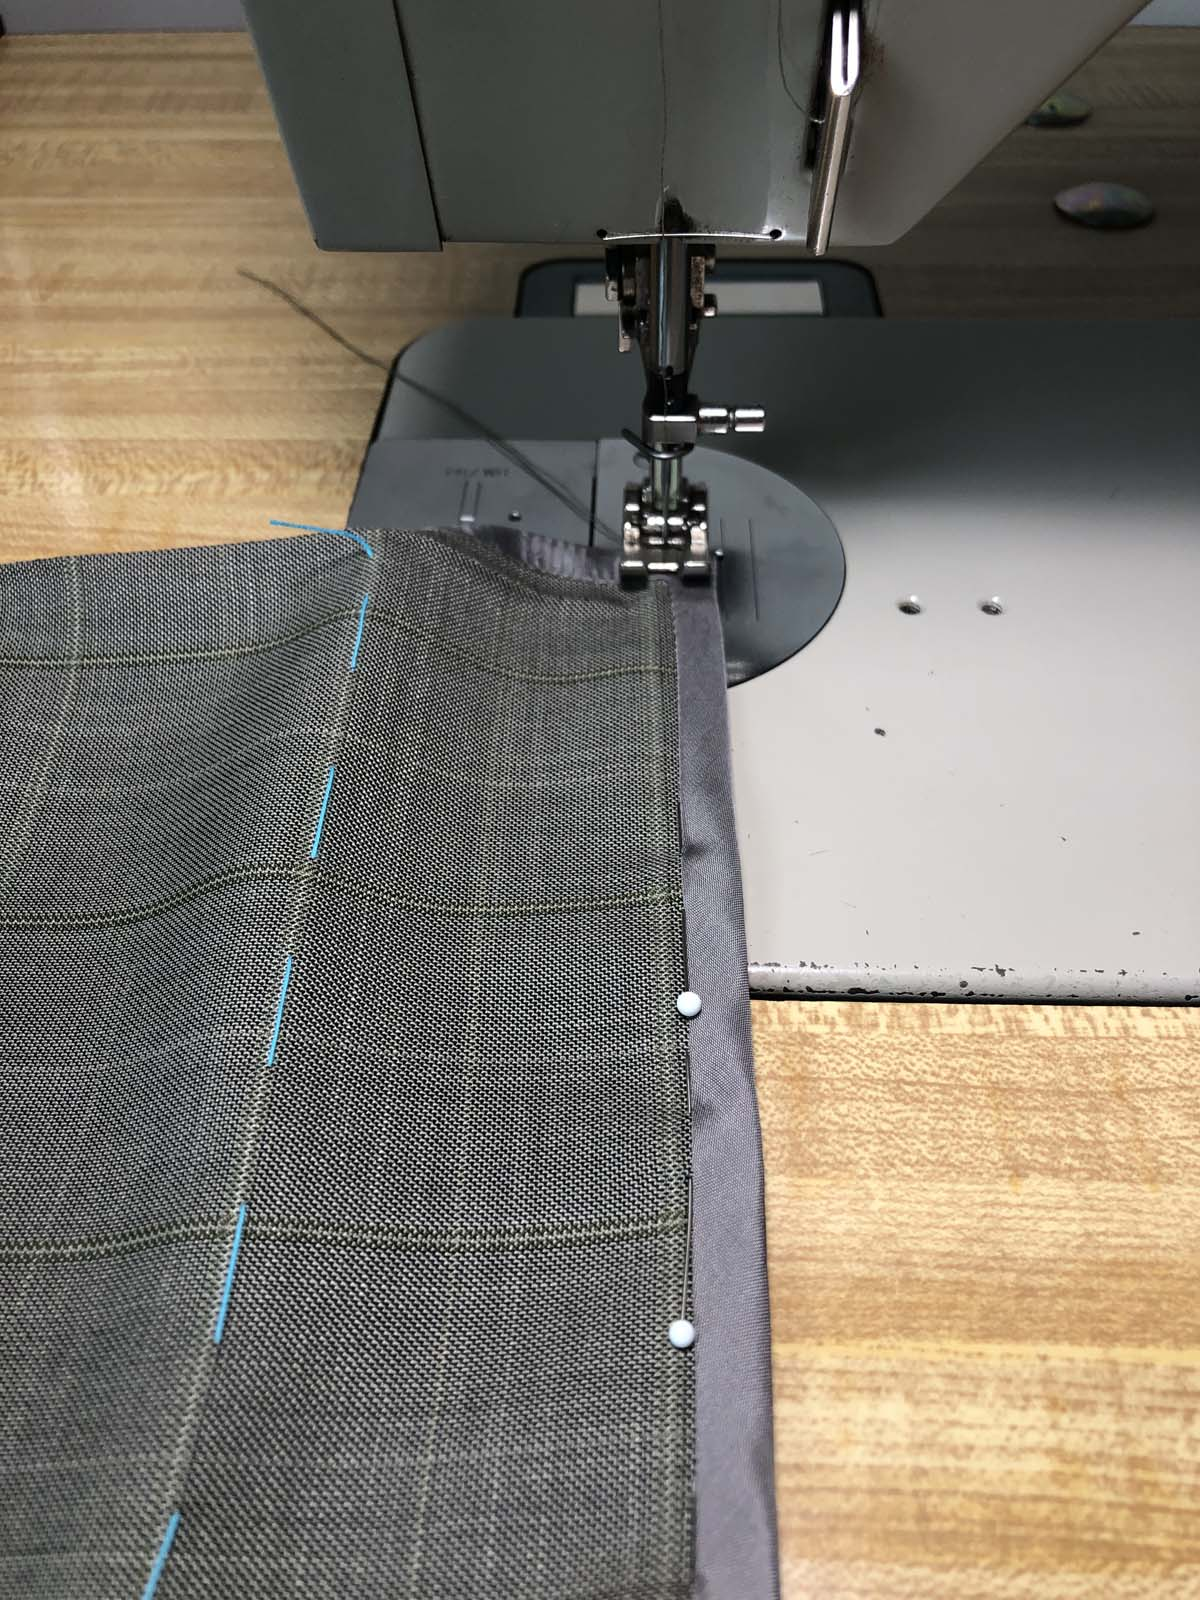 Hong Kong Seam Finish for Skirt Hem being sewn on sewing machine